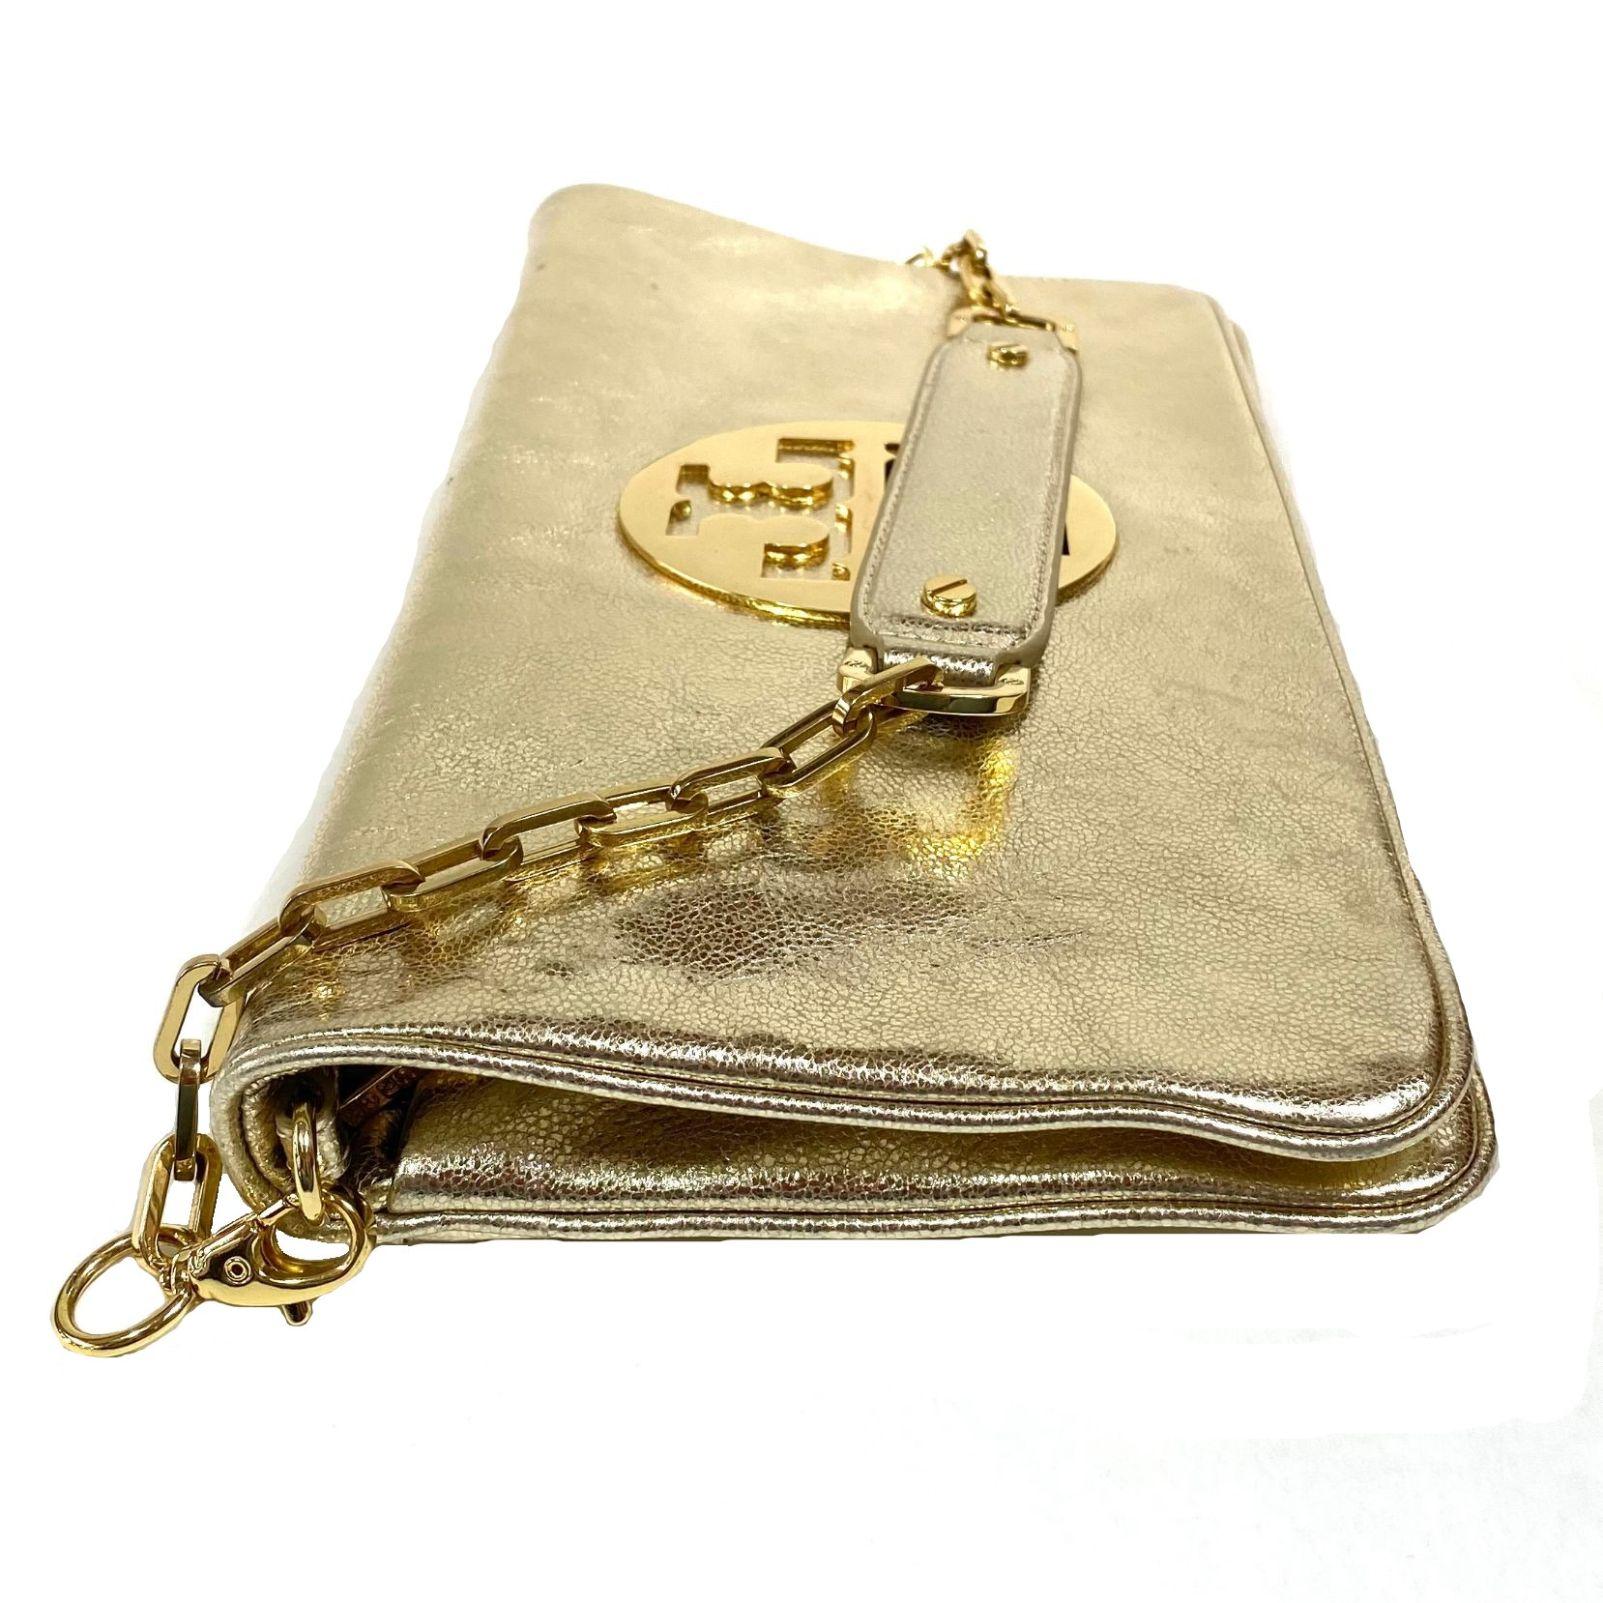 Bolsa Clutch Tory Burch Dourada